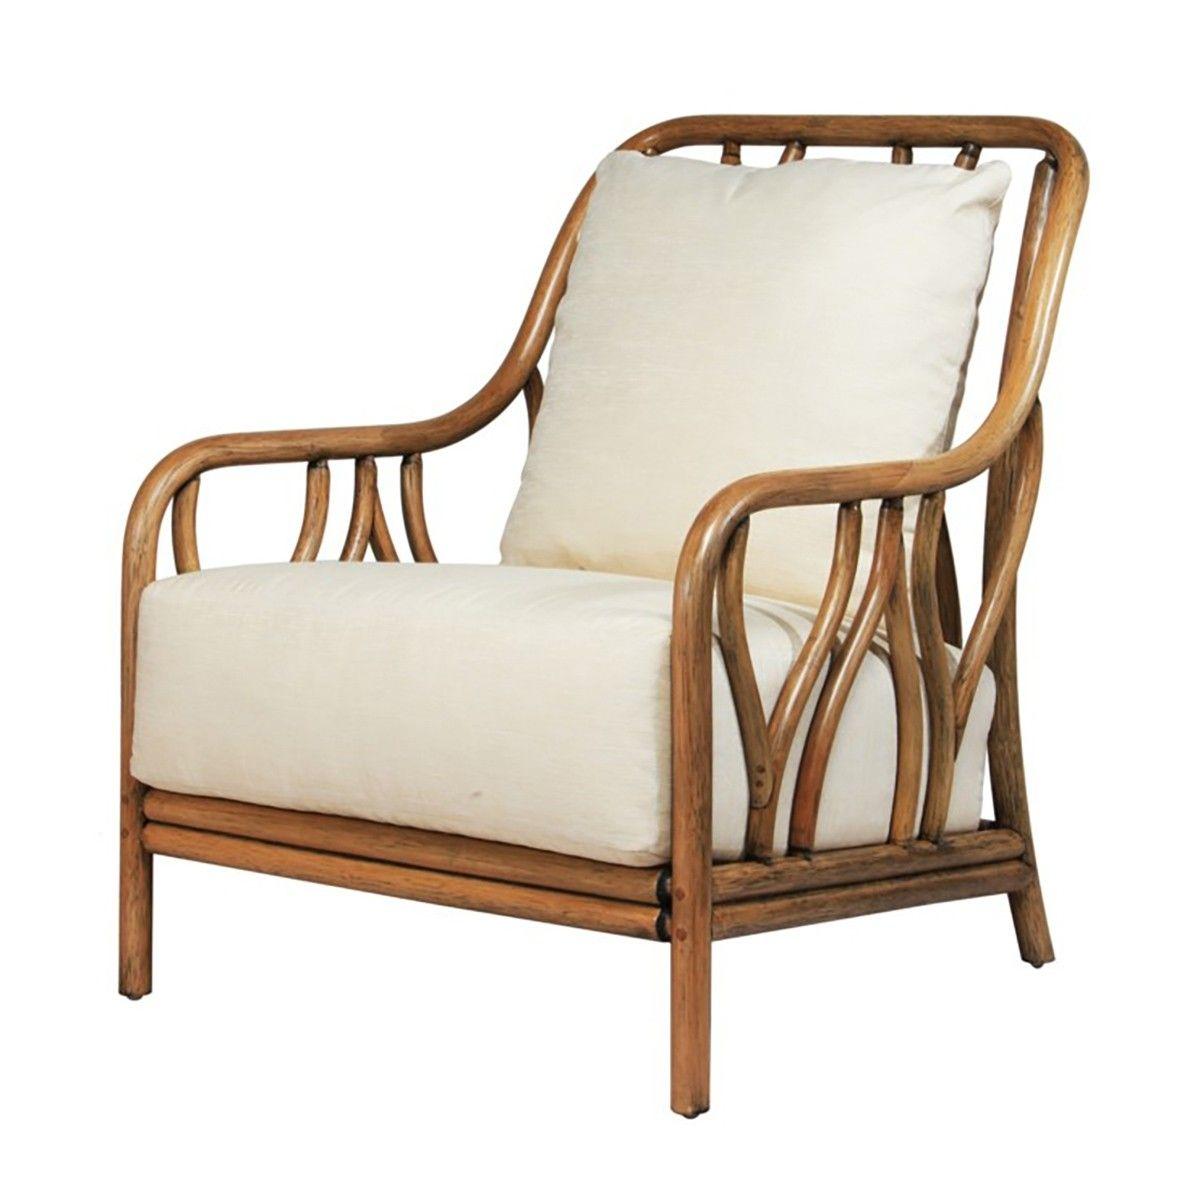 Selamat Wishbone Lounge Chair Nutmeg Chairs Living Room Furniture Candelabra Inc Tekli Koltuk Koltuklar Ev Mobilyalari